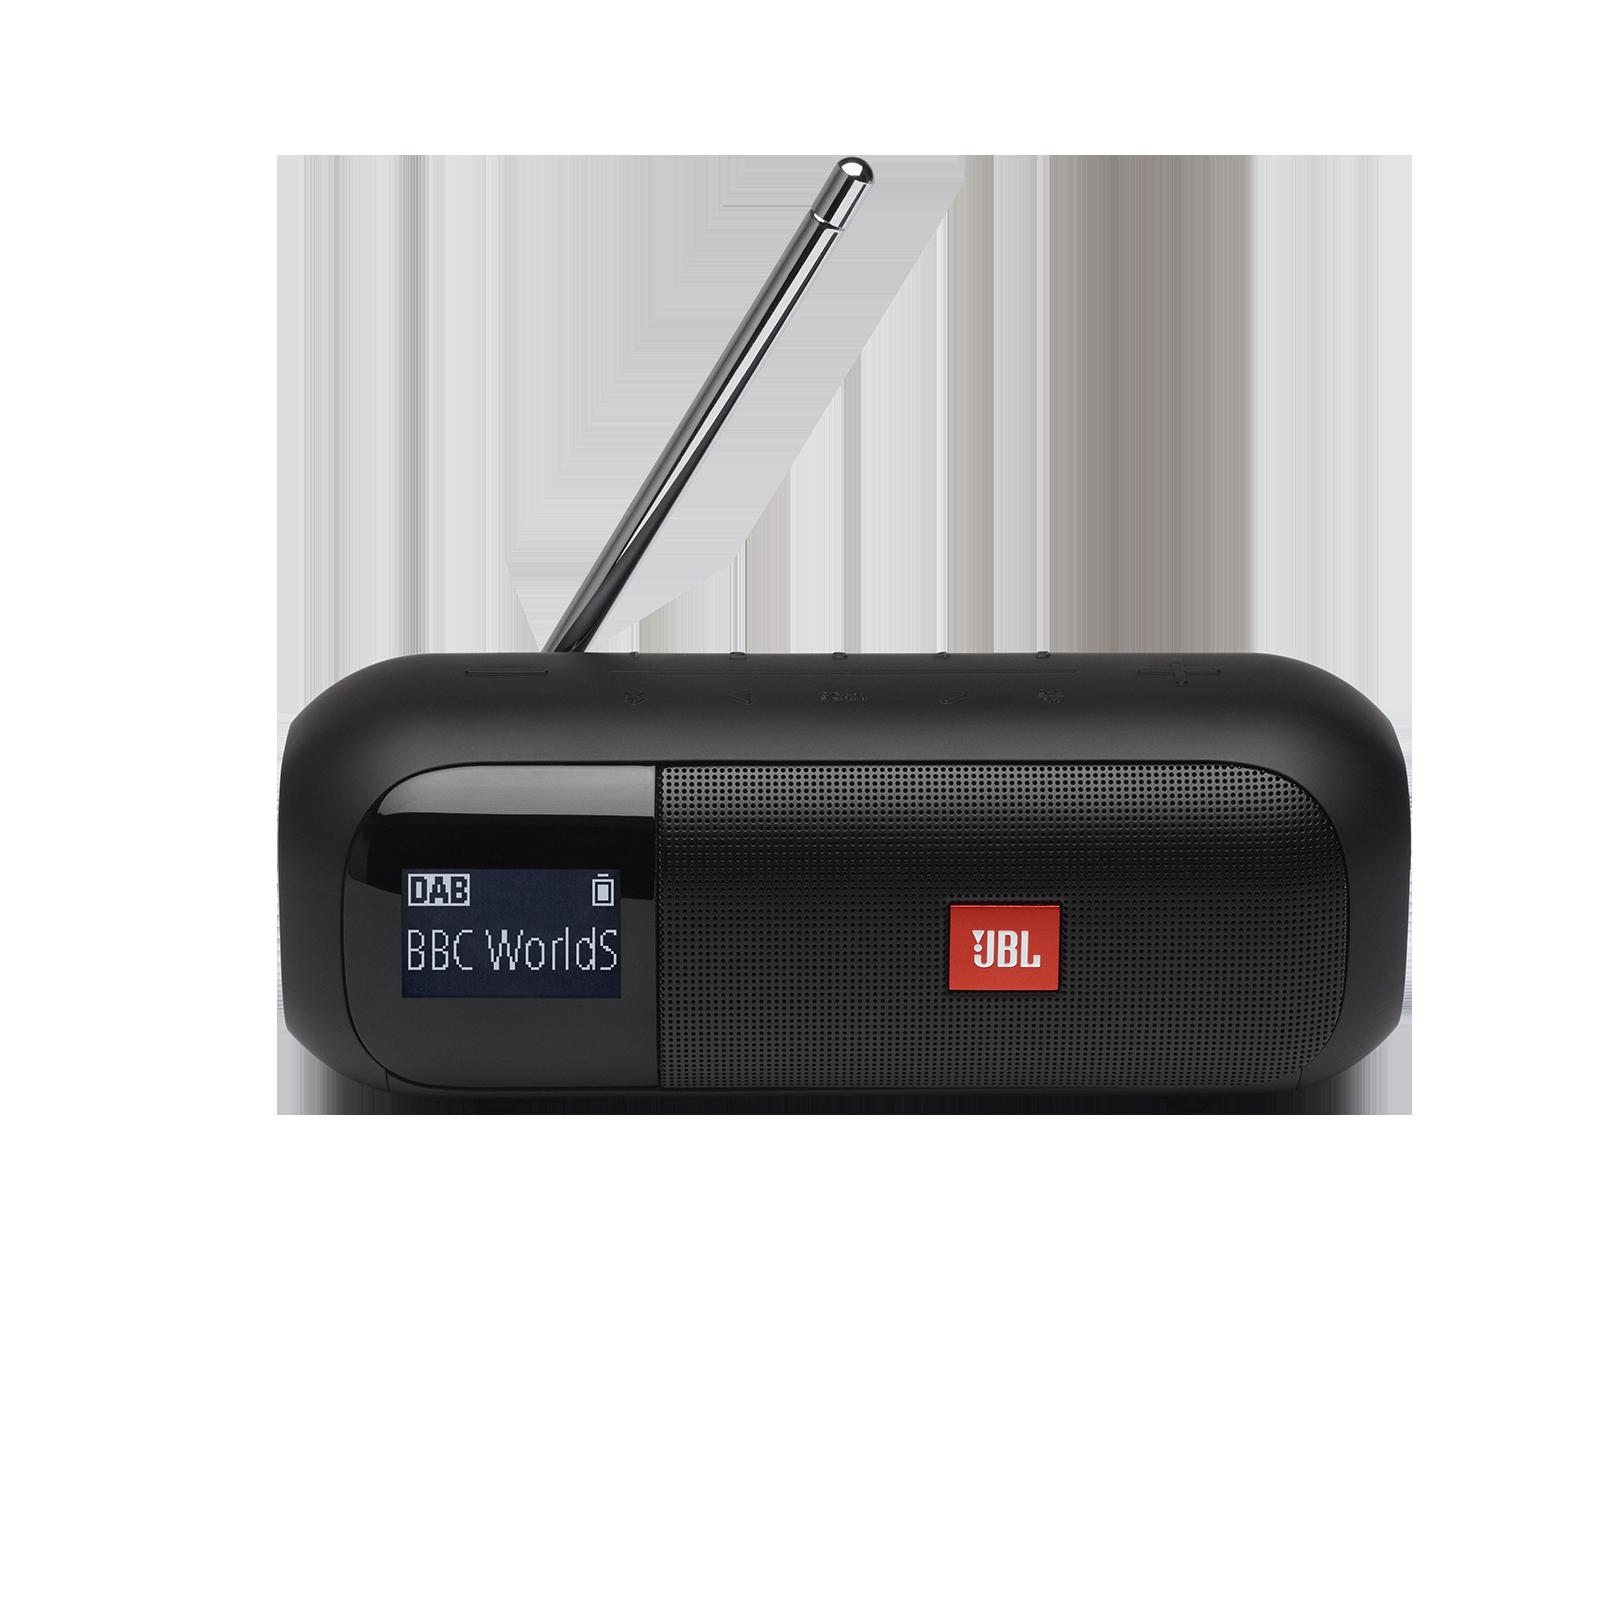 JBL Tuner 2 - Black - Portable DAB/DAB+/FM radio with Bluetooth - Front